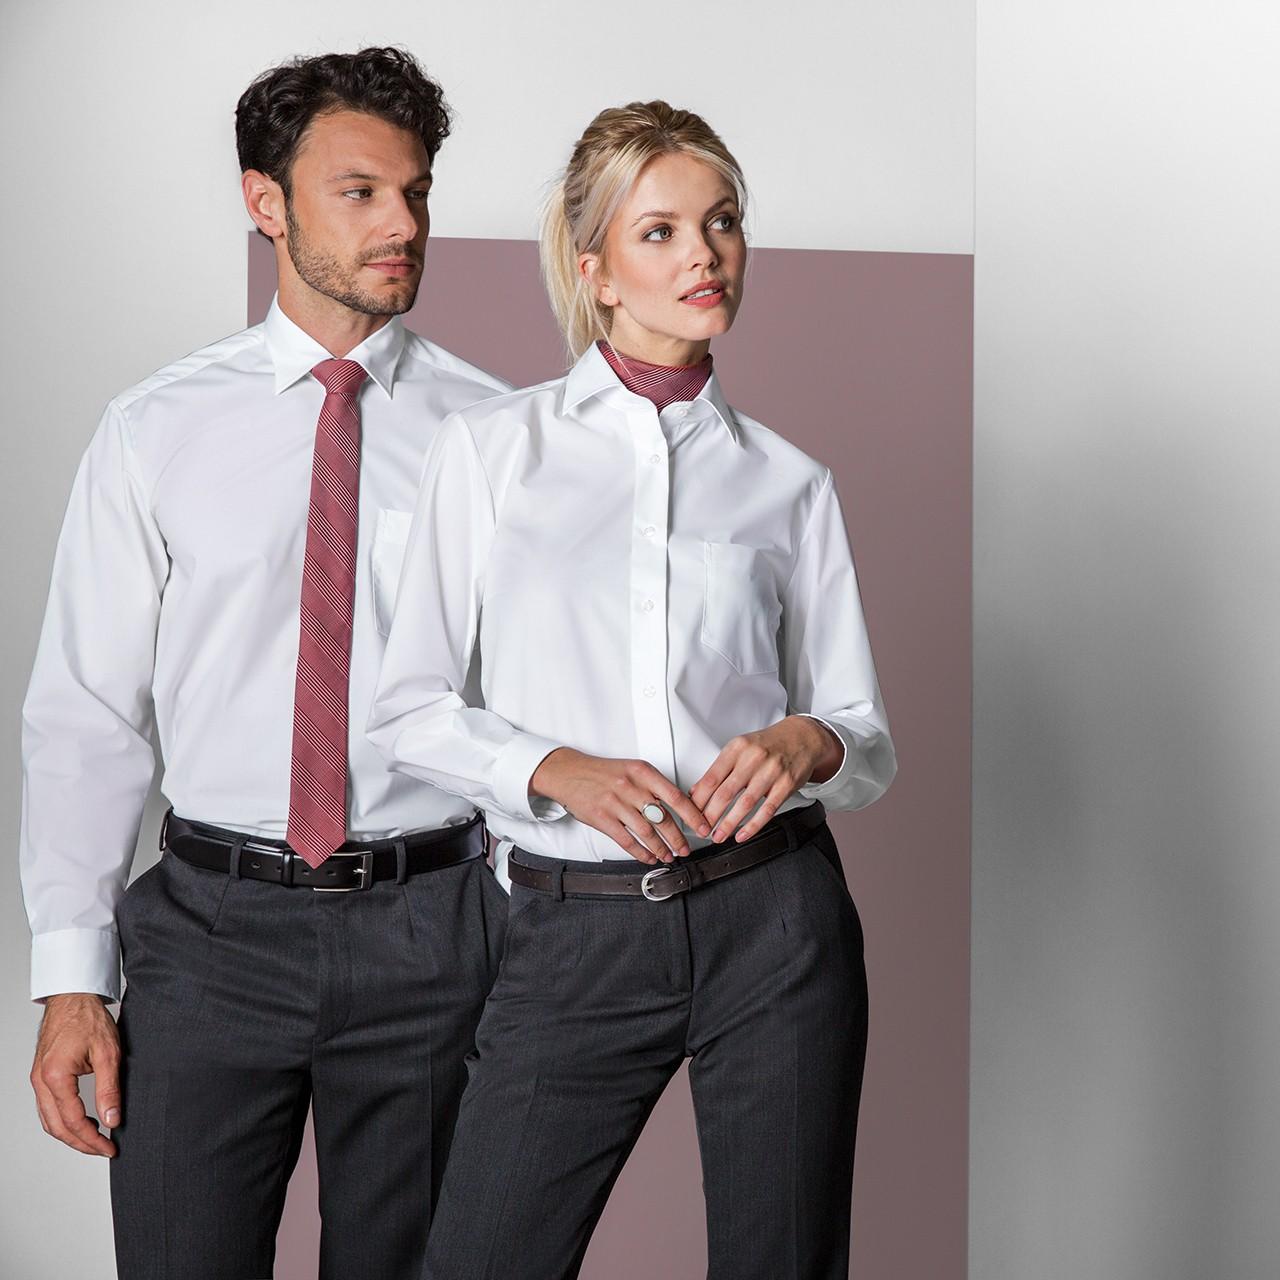 Basic Bluse Langarm Comfort Fit Weiß Greiff®   bedrucken, besticken, bedrucken lassen, besticken lassen, mit Logo  